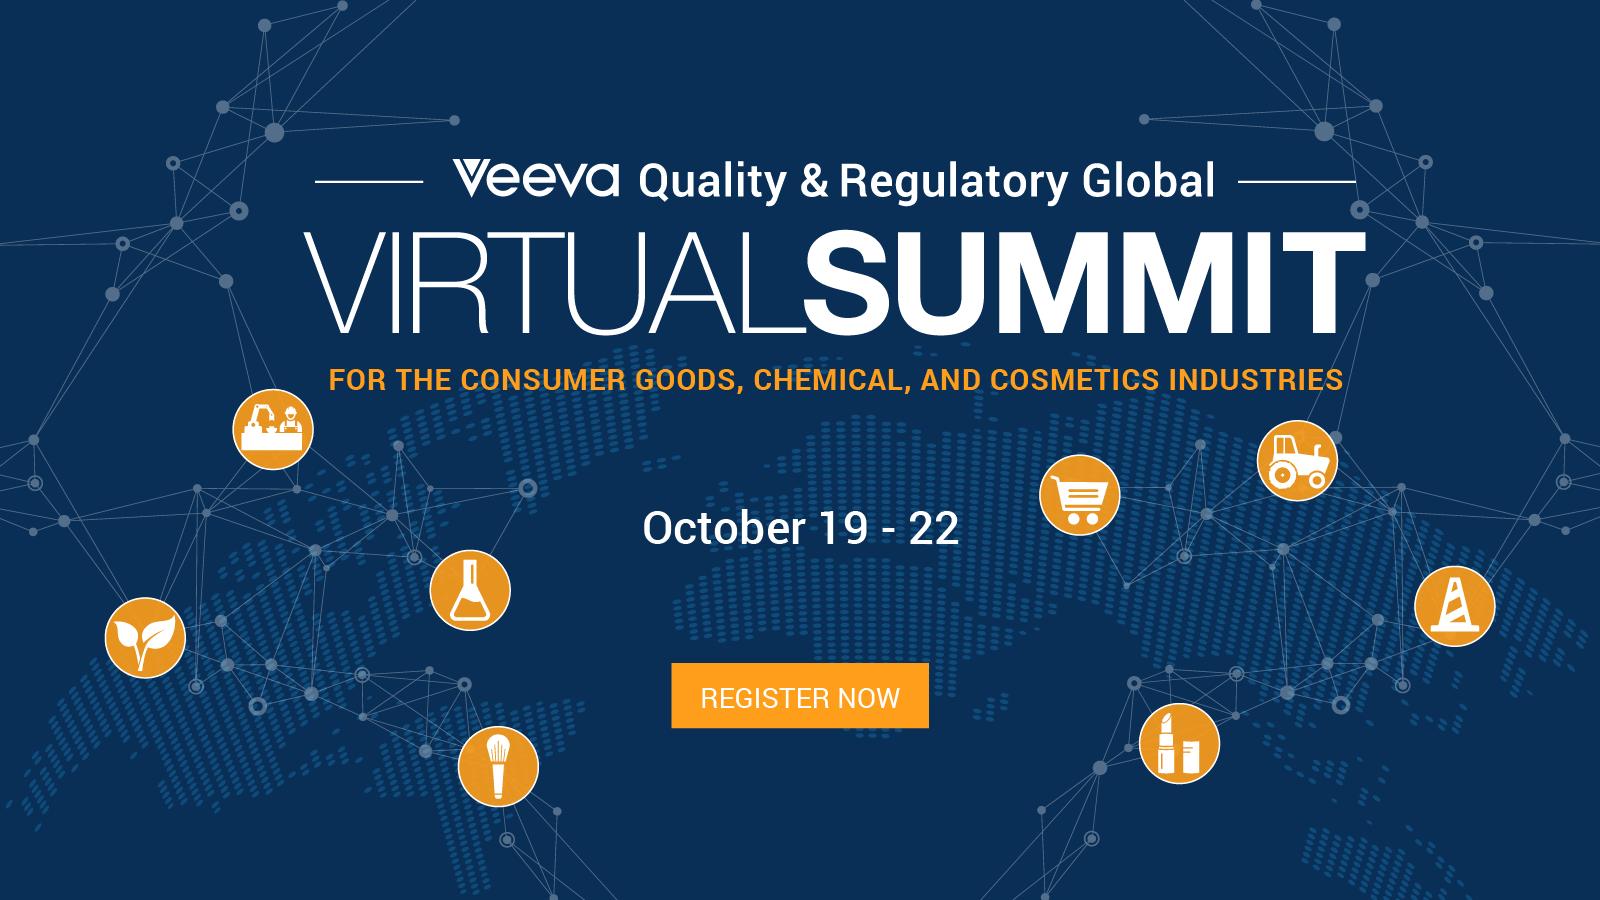 Q&R Virtual Summit_1600x900 (3)